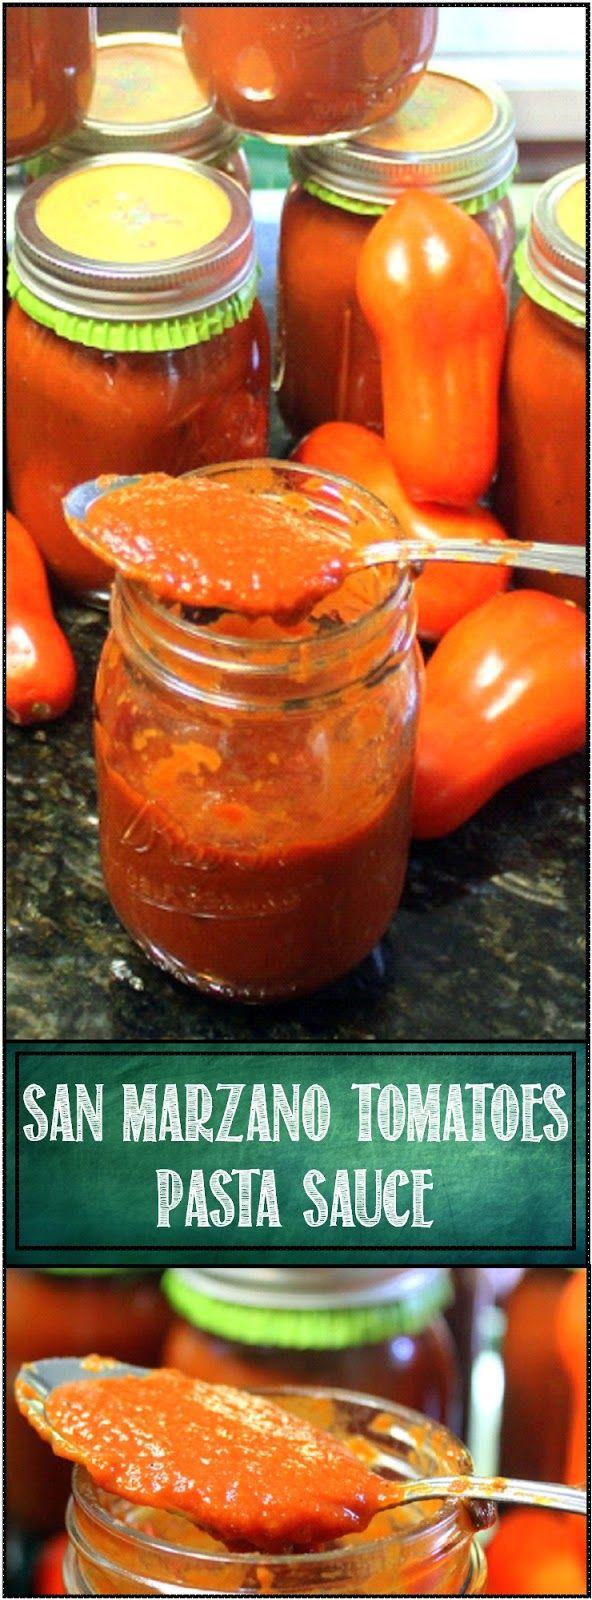 Inspired By eRecipeCards: San Marzano Tomato Sauce - 52 Authentic Italian Recipes CROCK POT EASY Canning Ideas